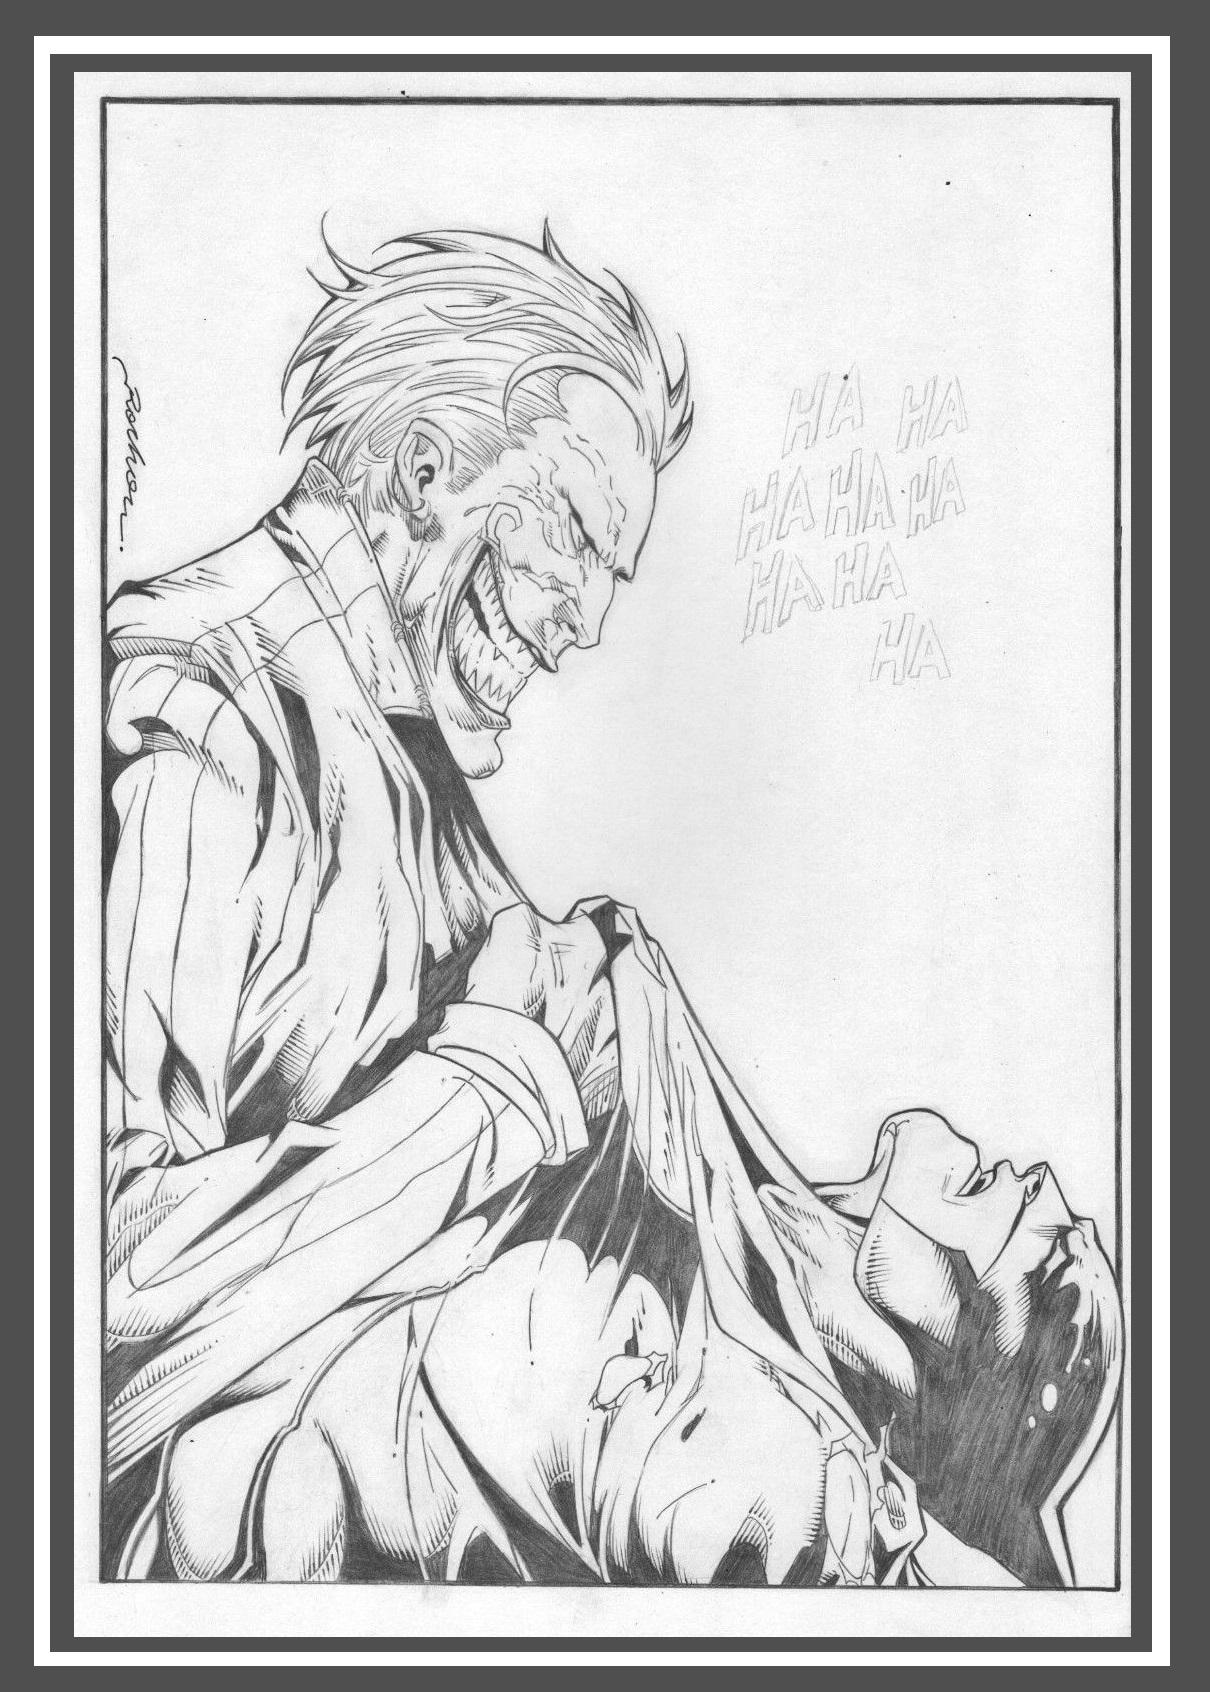 Dessin Original Crayonne Joker Vs Batman Par Rocha By Rocha